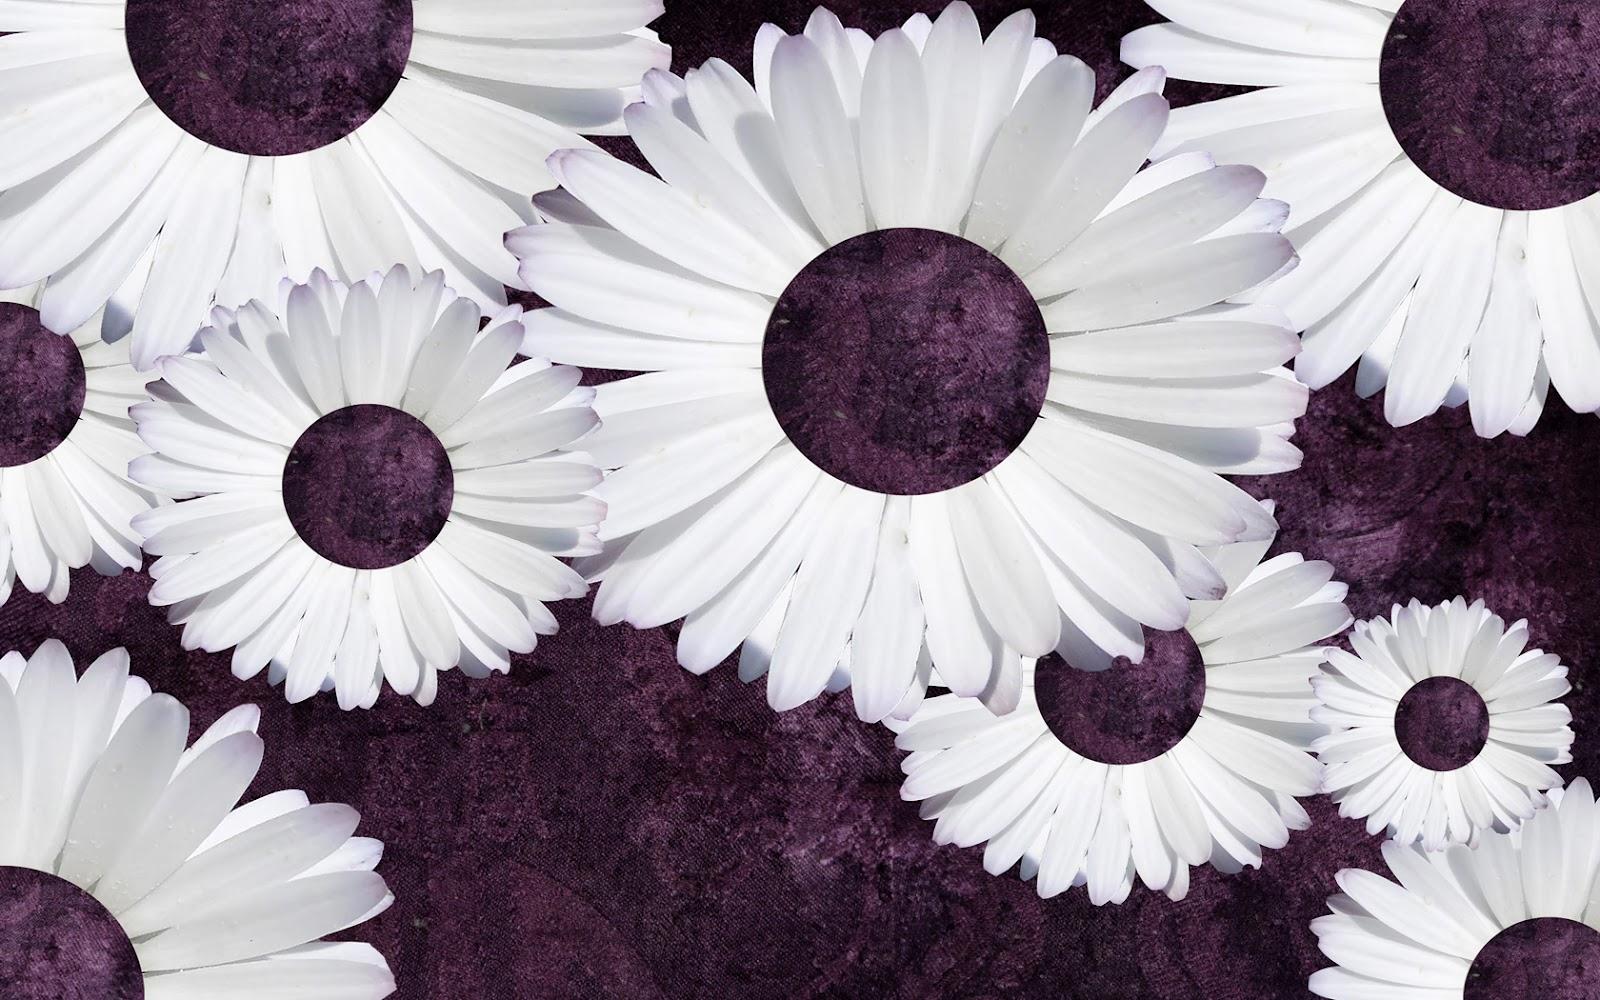 Purple Daisies Tumblr